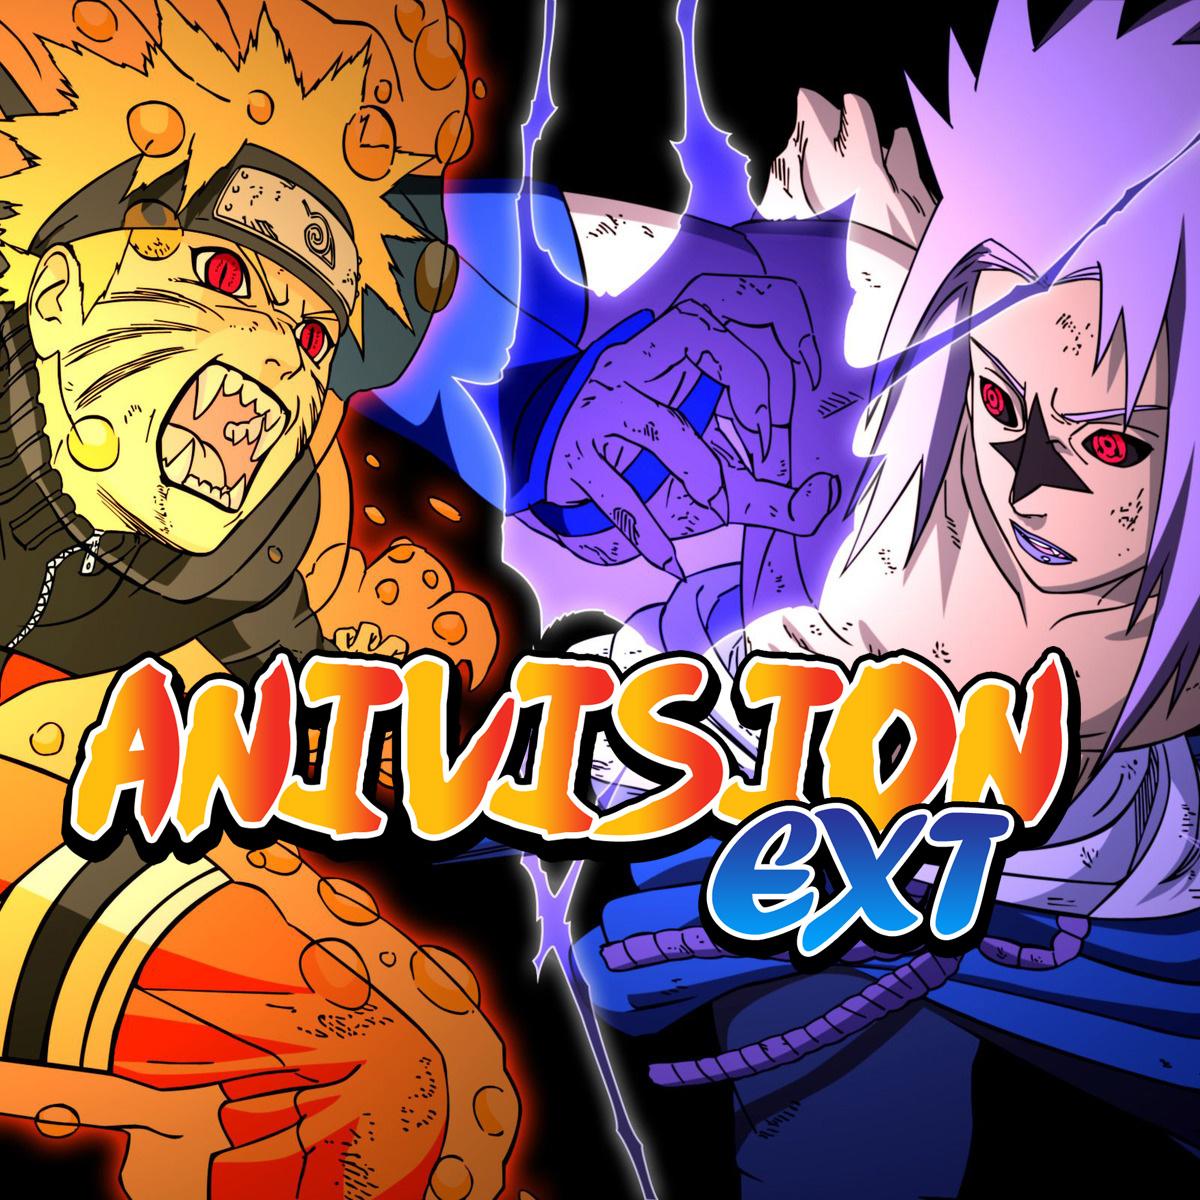 Anivision [EXT]: BioShock Infinite | Anivision